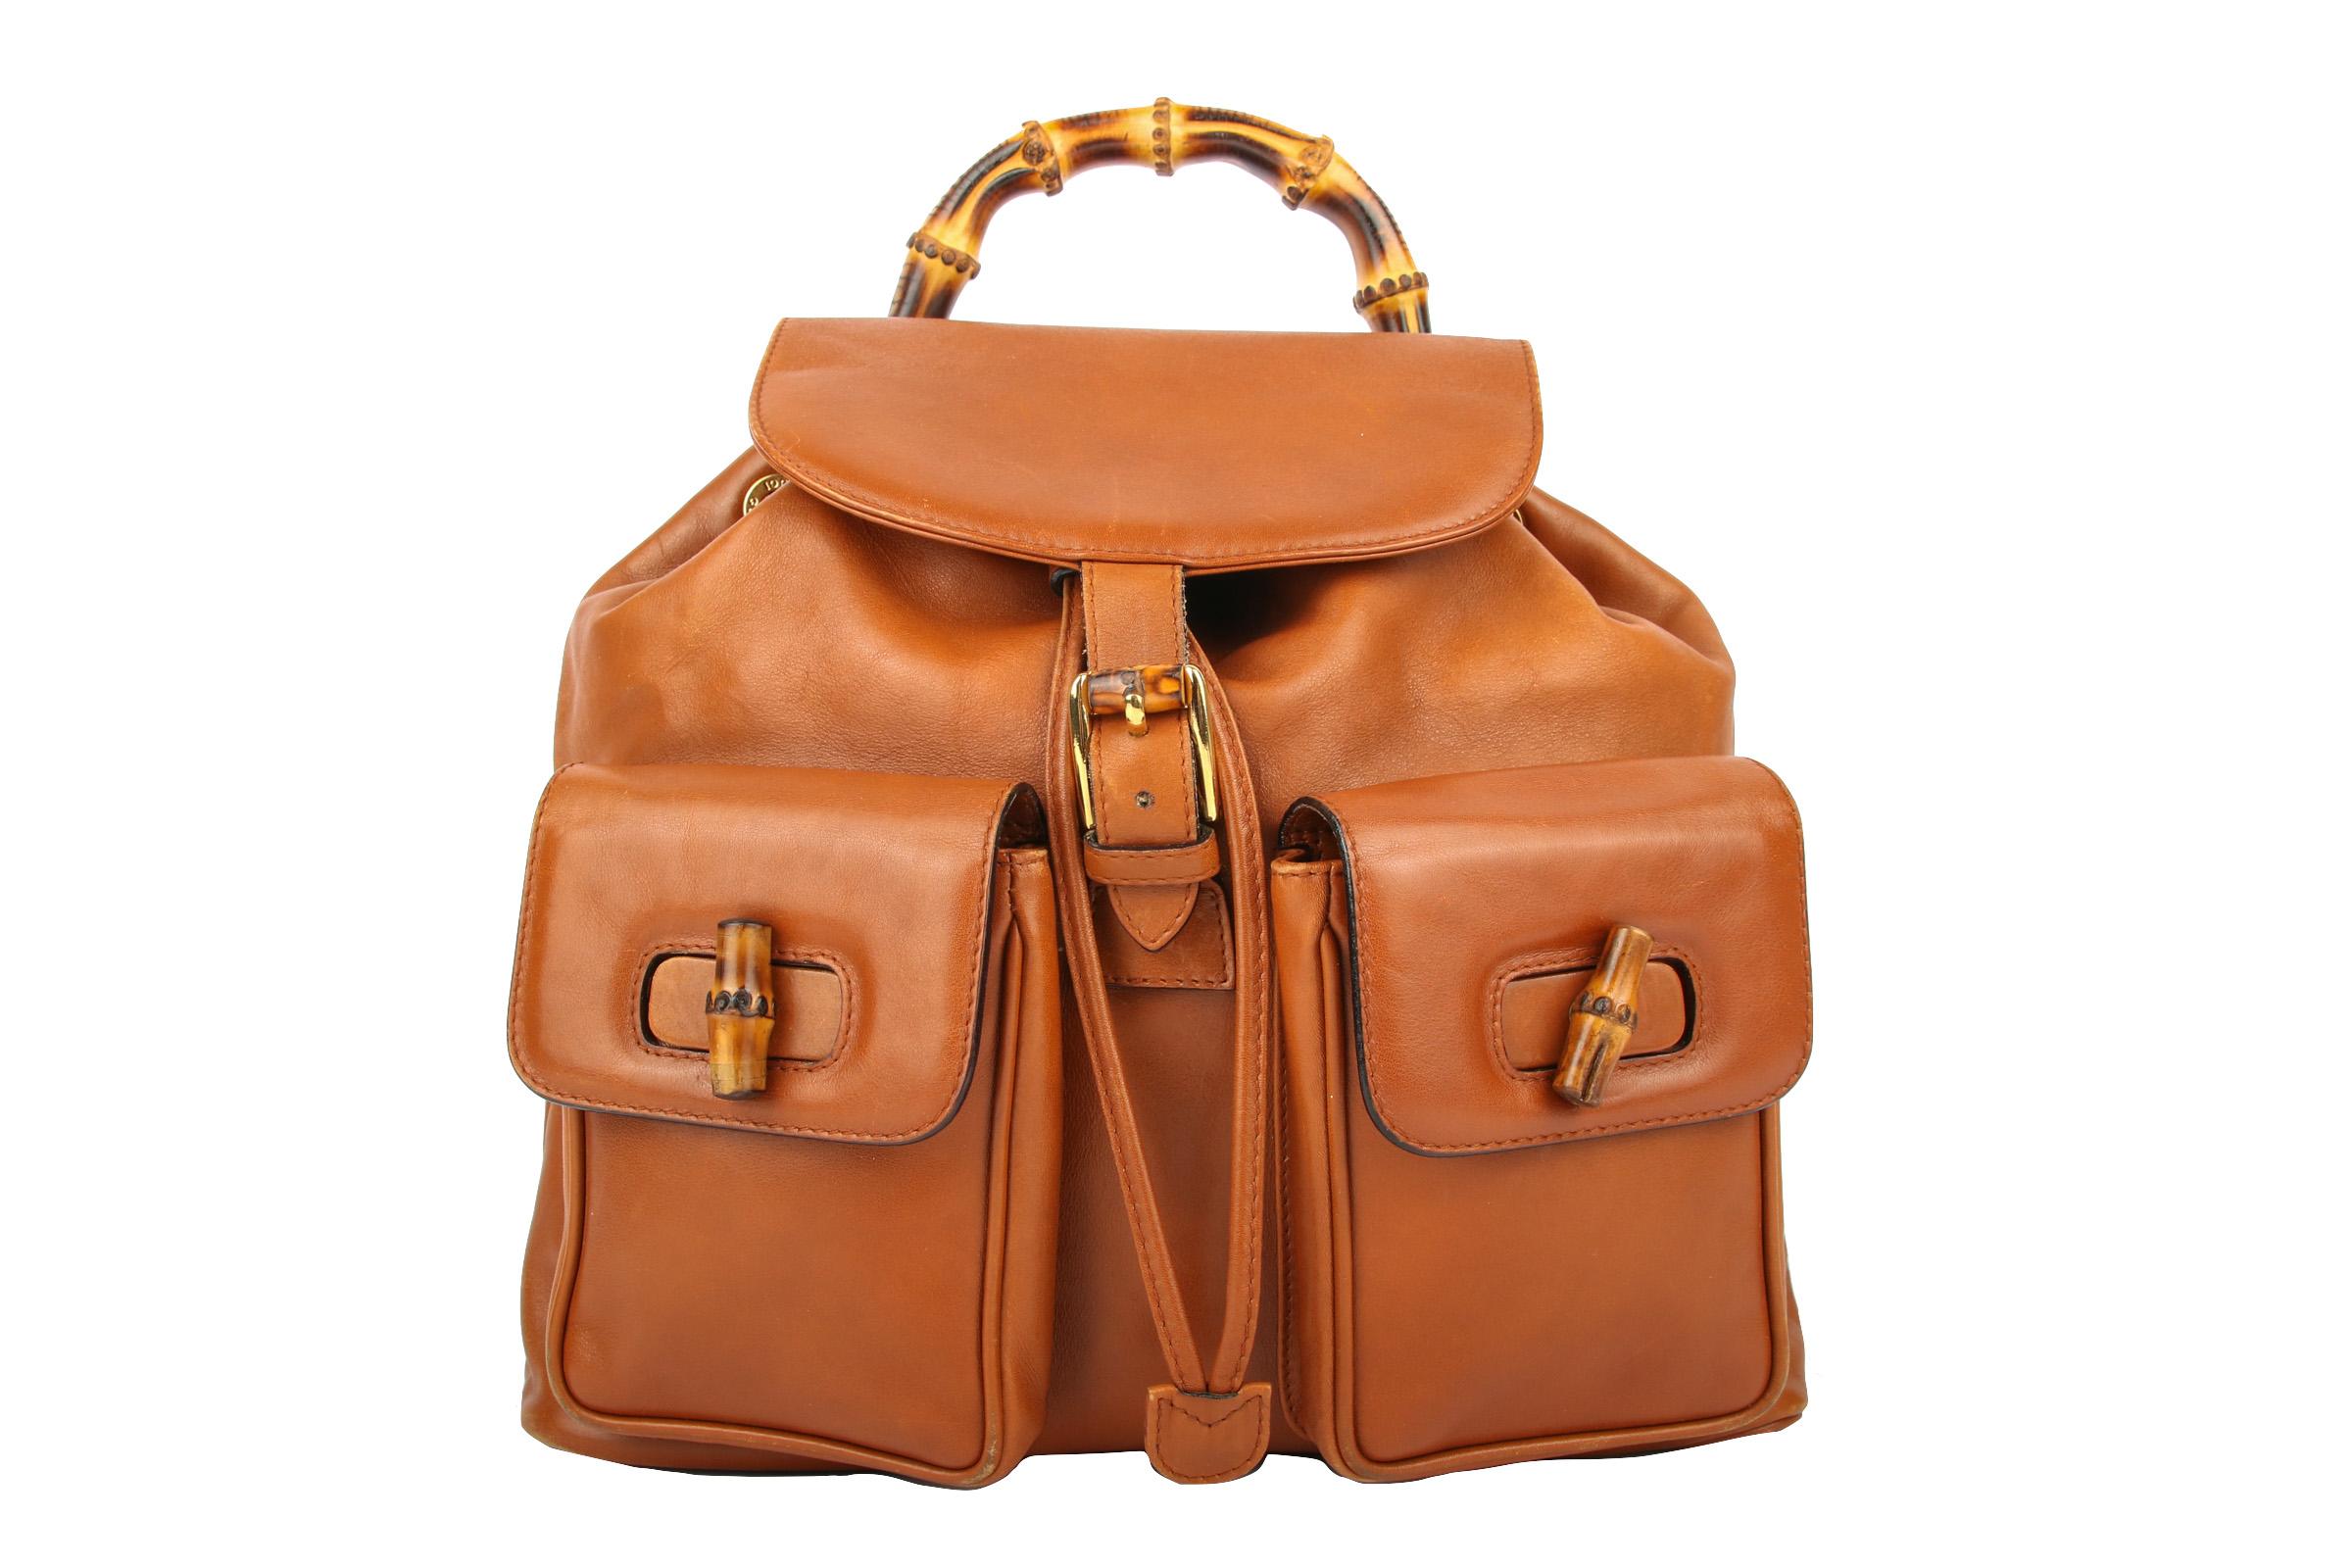 d6ced5919f45 Gucci Handbags & Accessories | Luxussachen.com